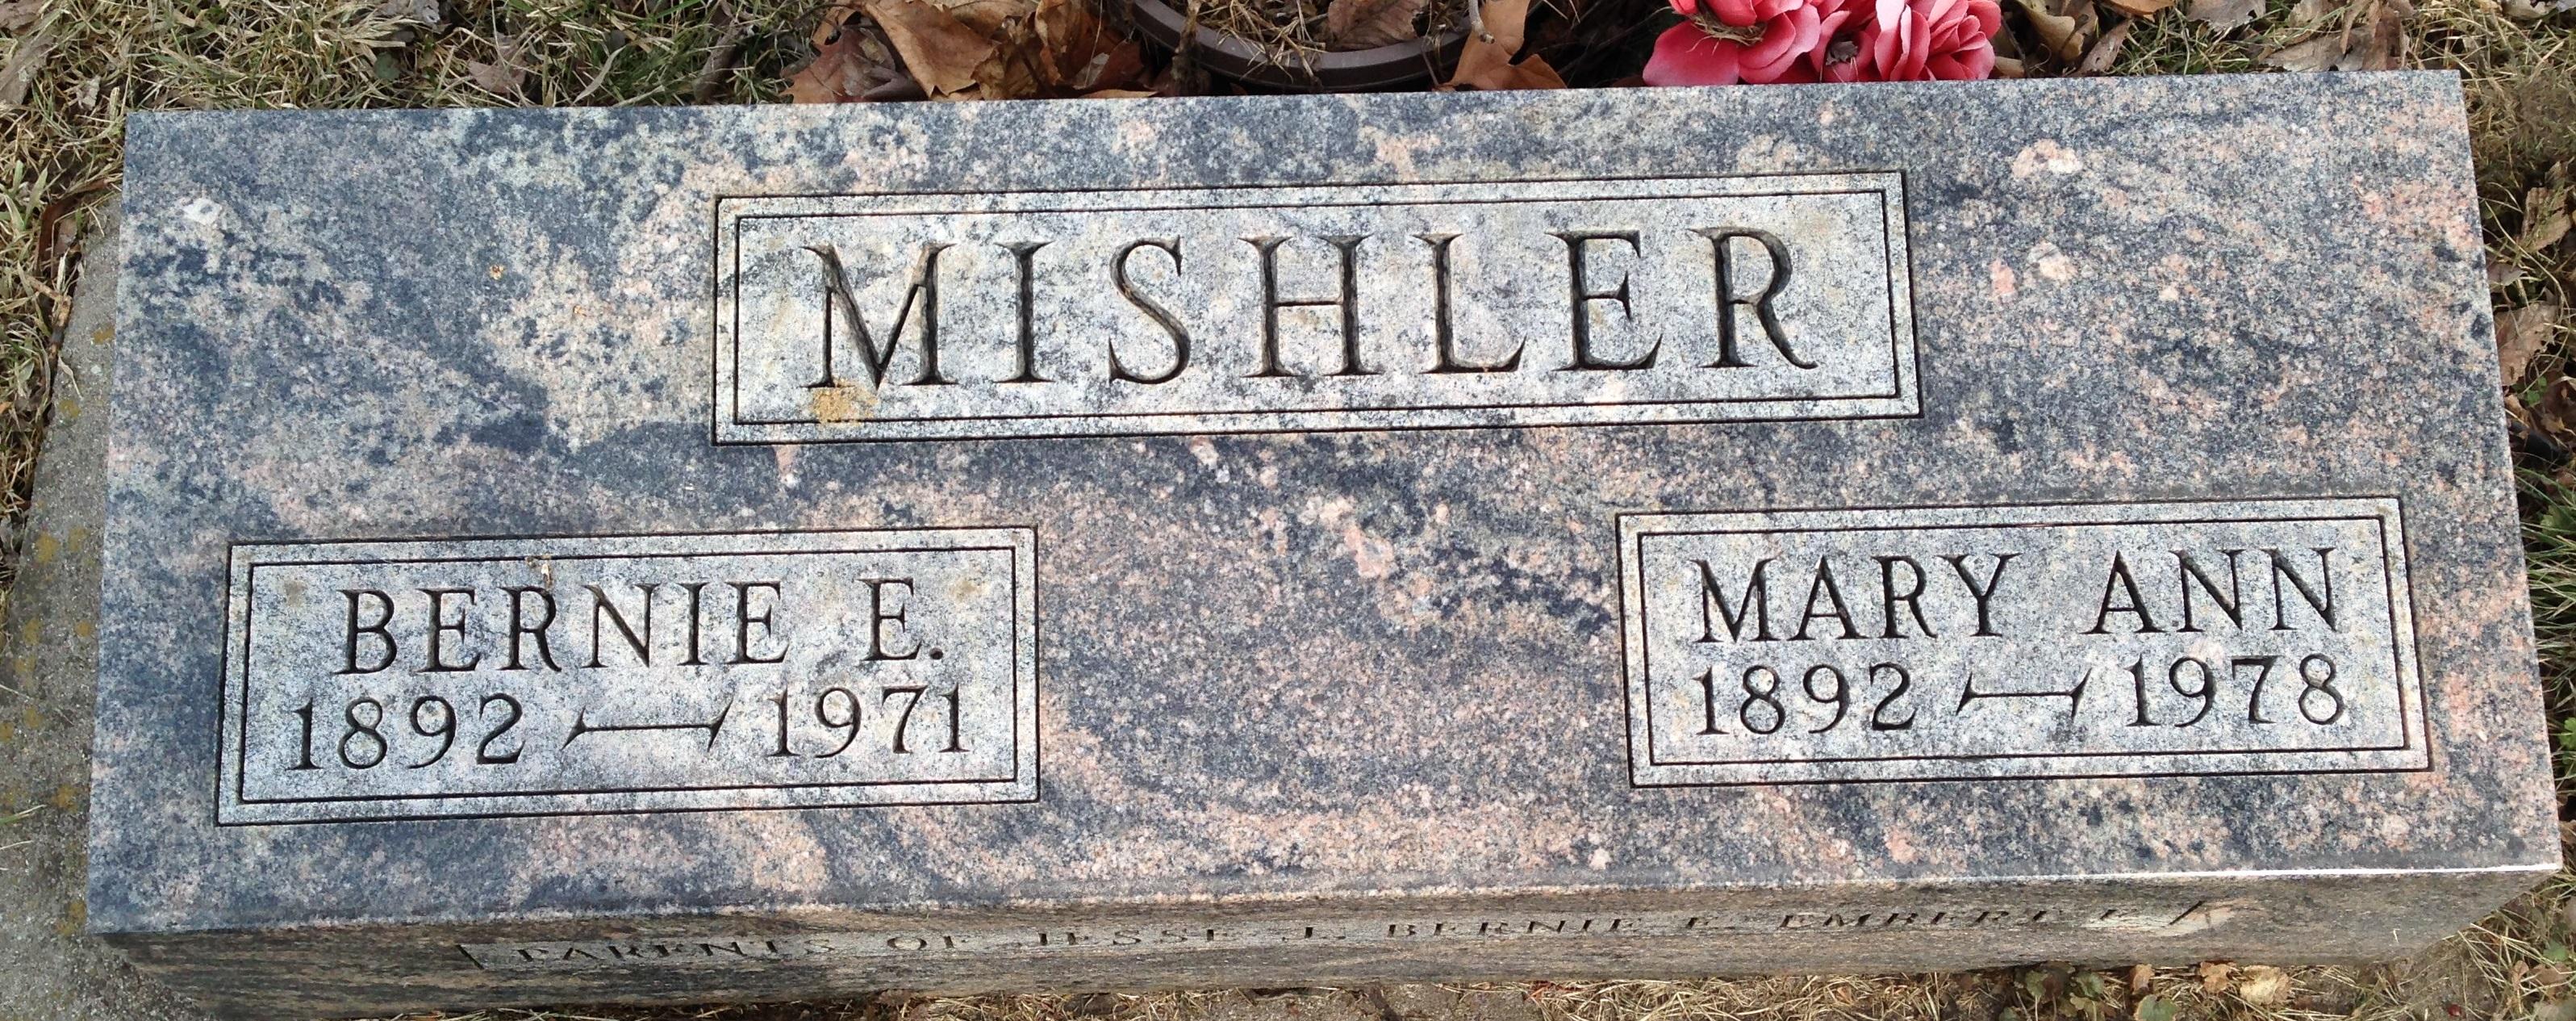 Floyd Mishler